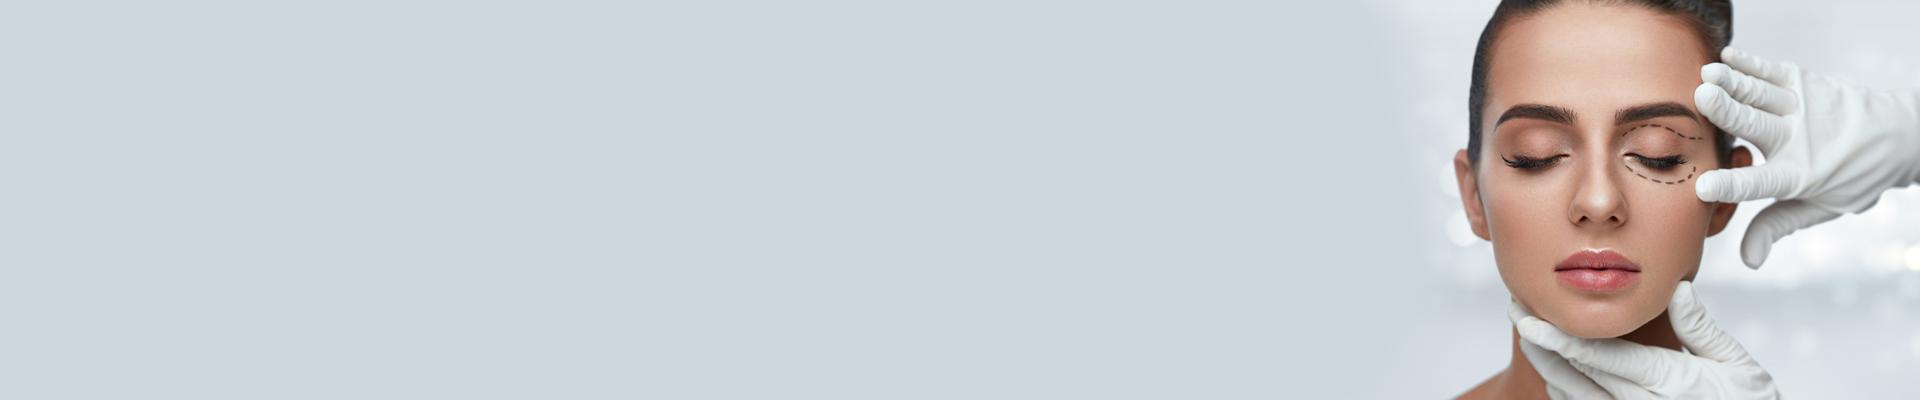 [:fr]Blépharoplastie à Nabeul Prix : chirurgie correctrice des paupières[:ar]جراحة الجفن في نابل السعر: جراحة الجفن التصحيحية[:]